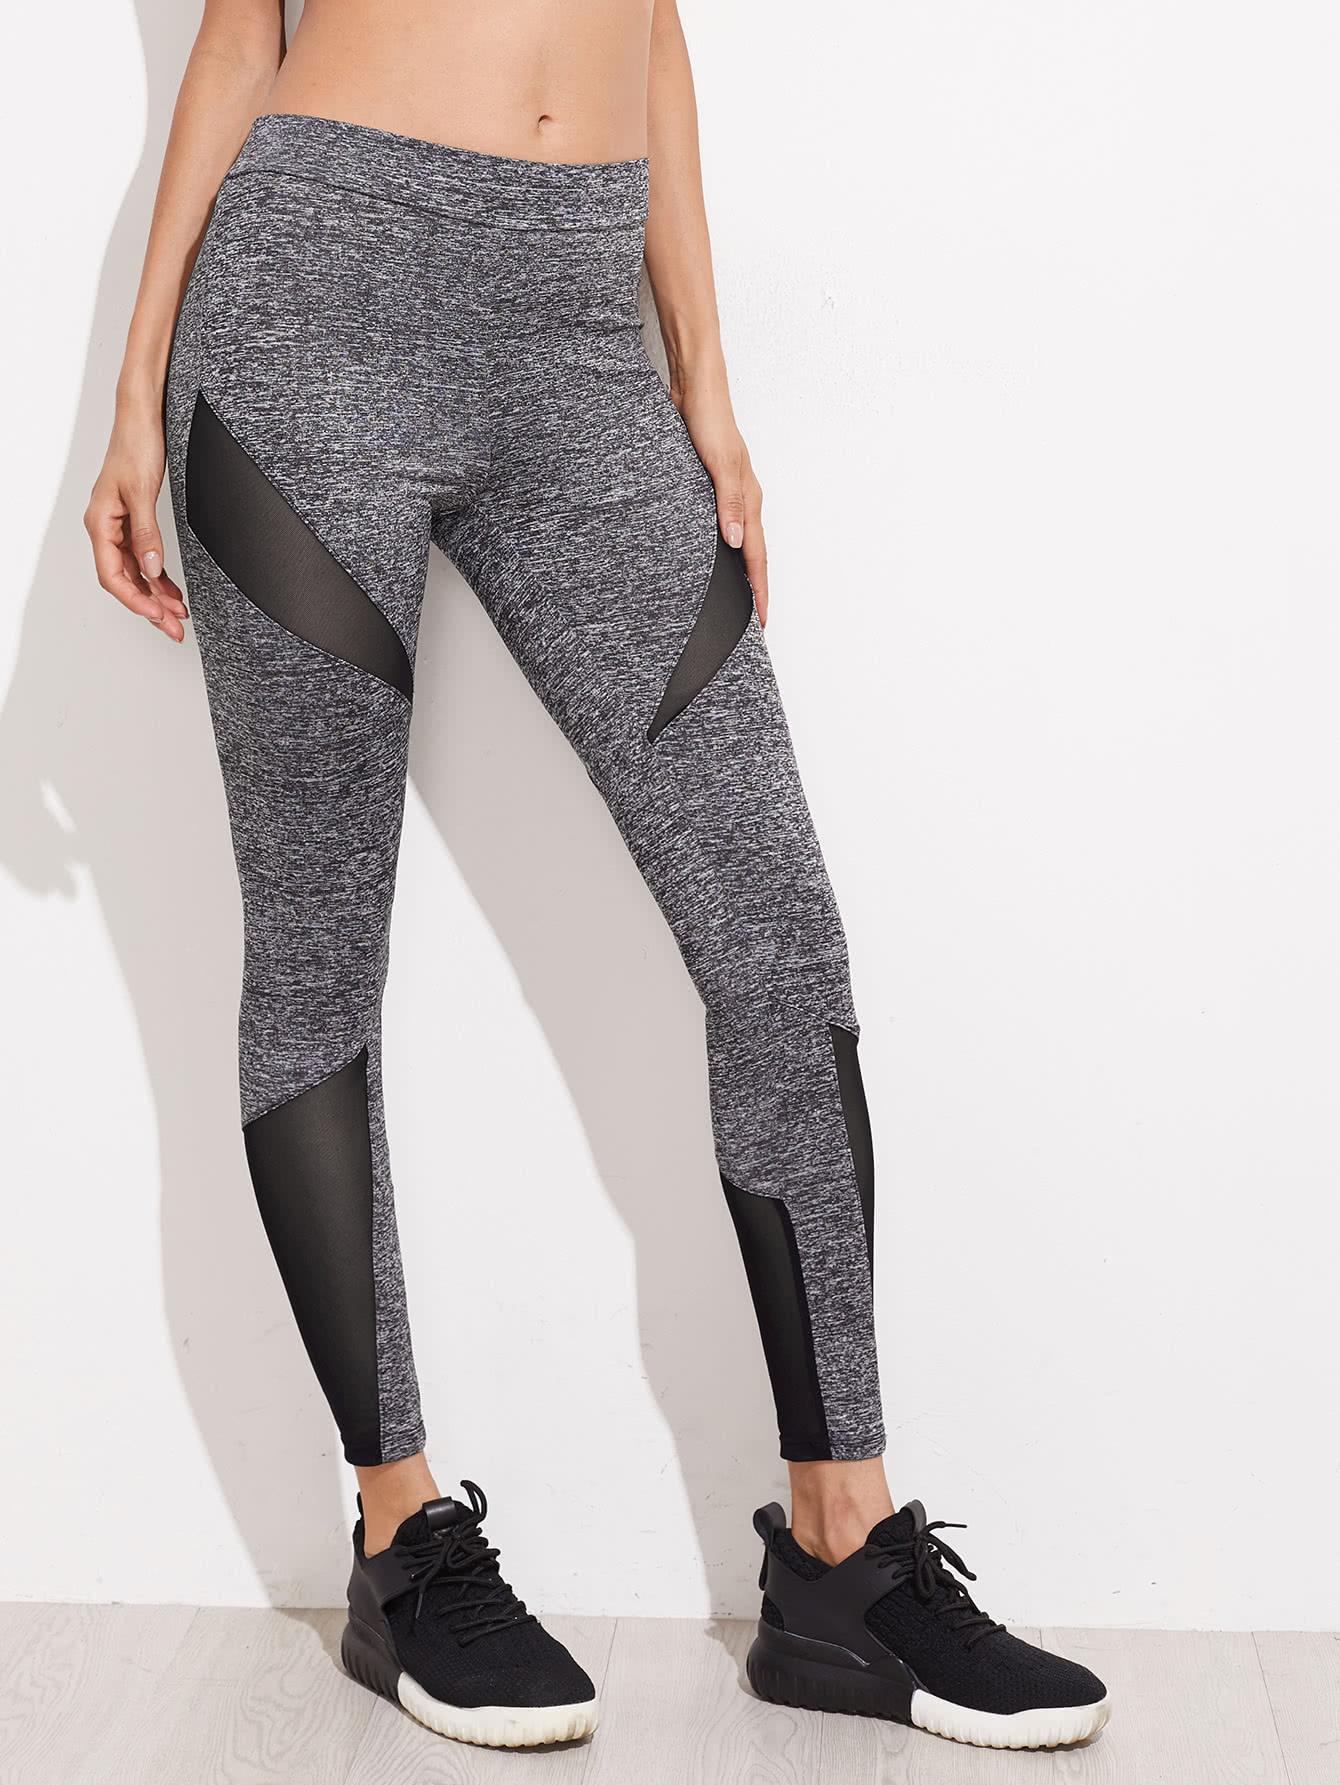 Mesh Insert Marled Knit Leggings marled knit topstitch stirrup leggings